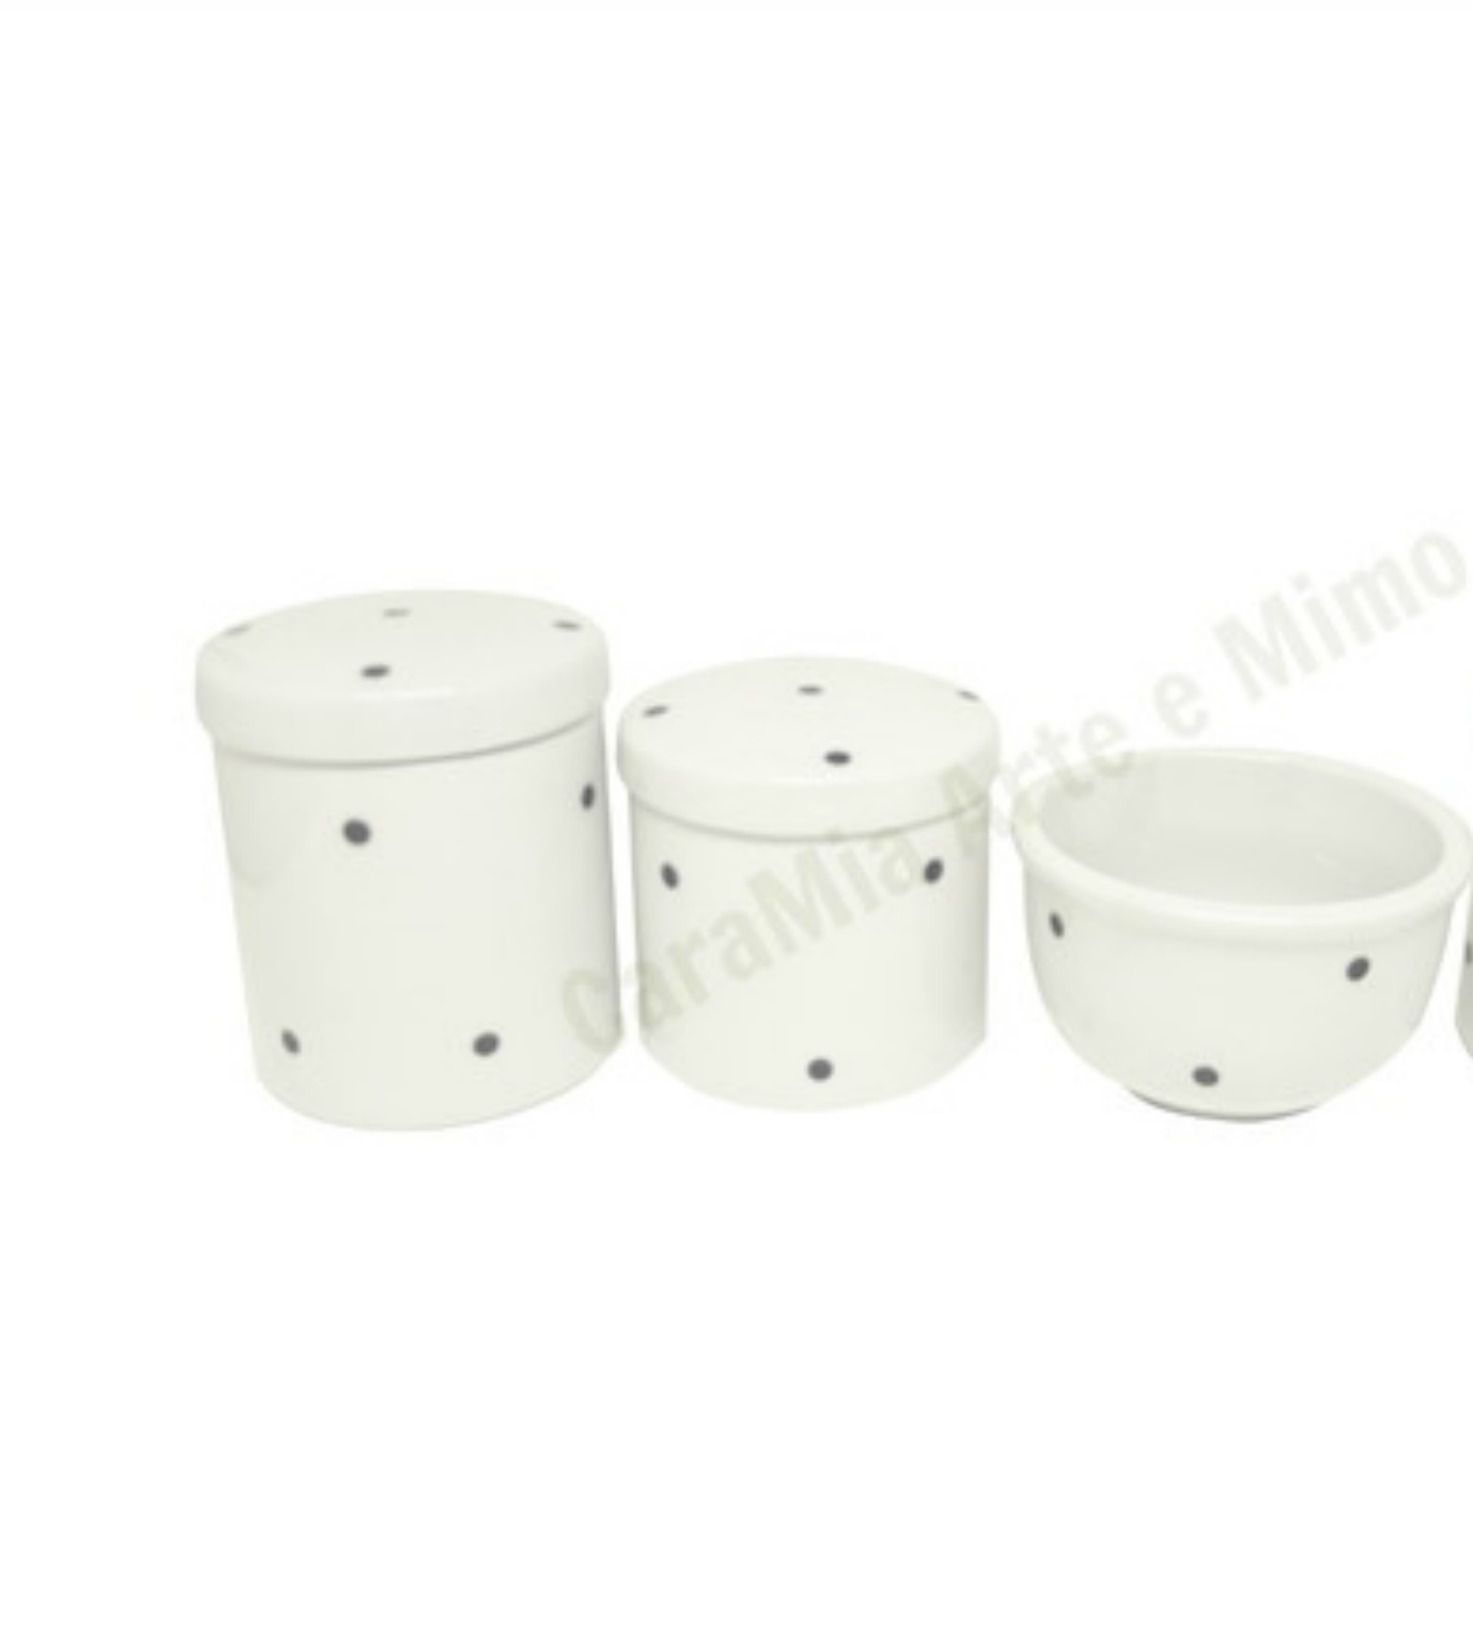 Kit Higiene Bebê Porcelana Poa Preto 3 peças